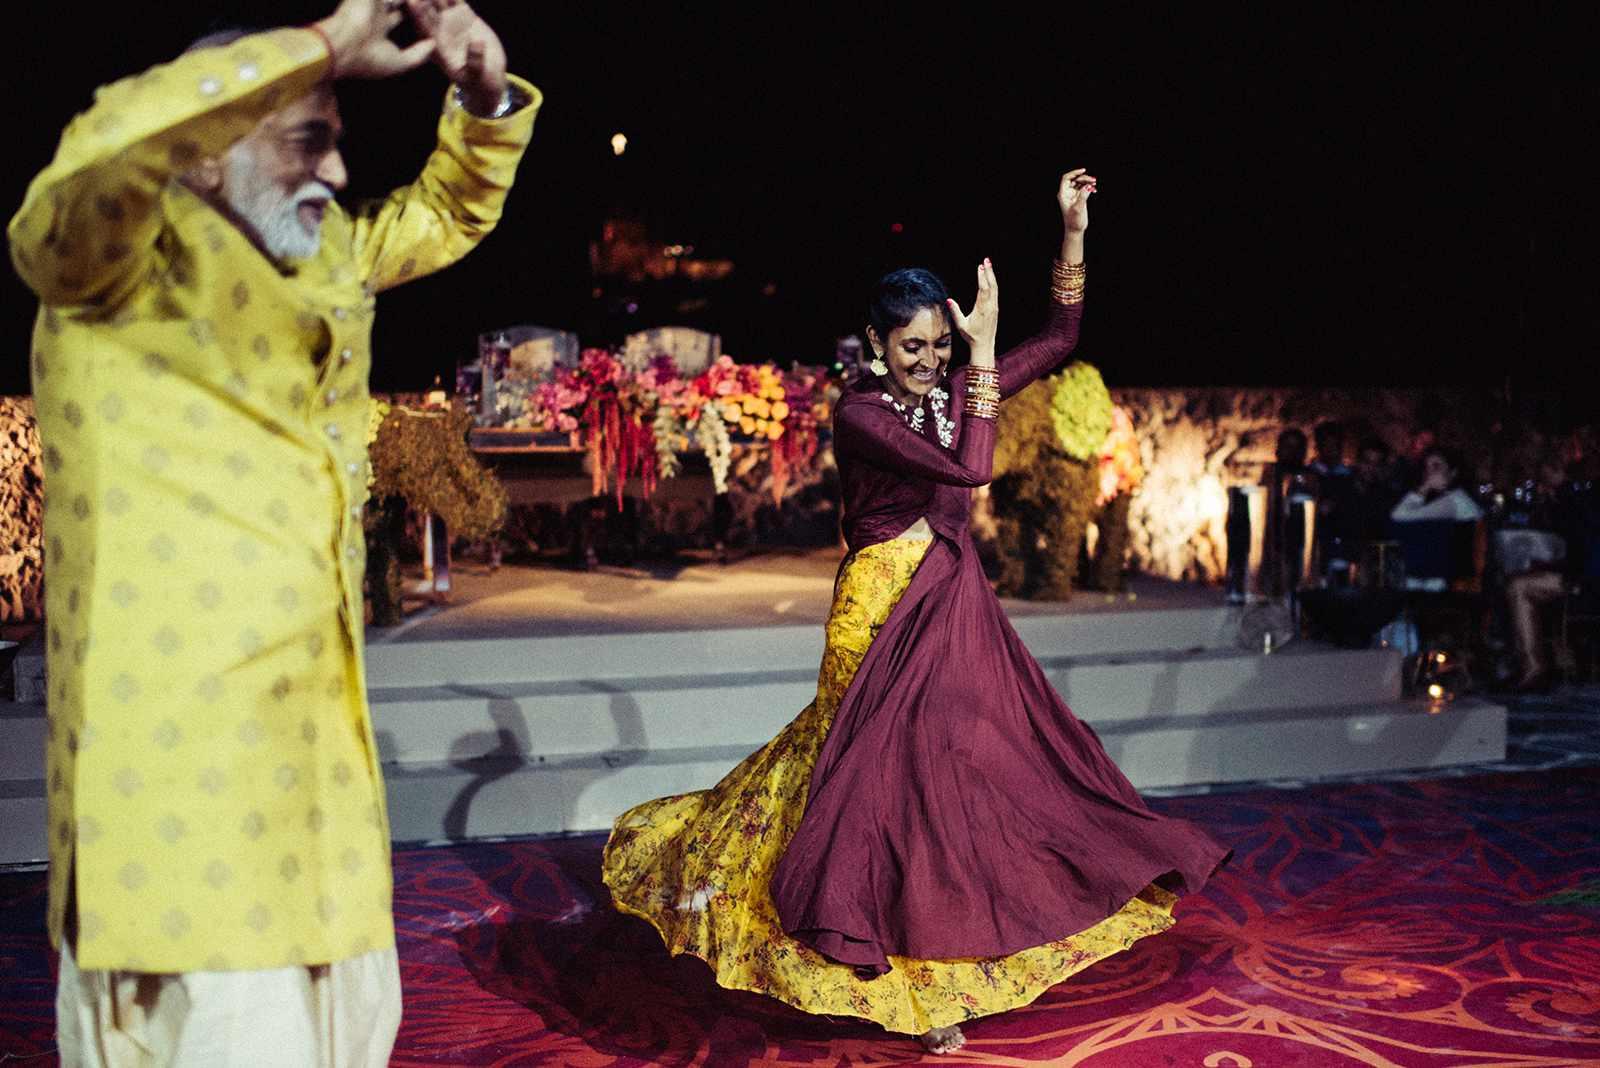 Couple dancing at Hindu wedding